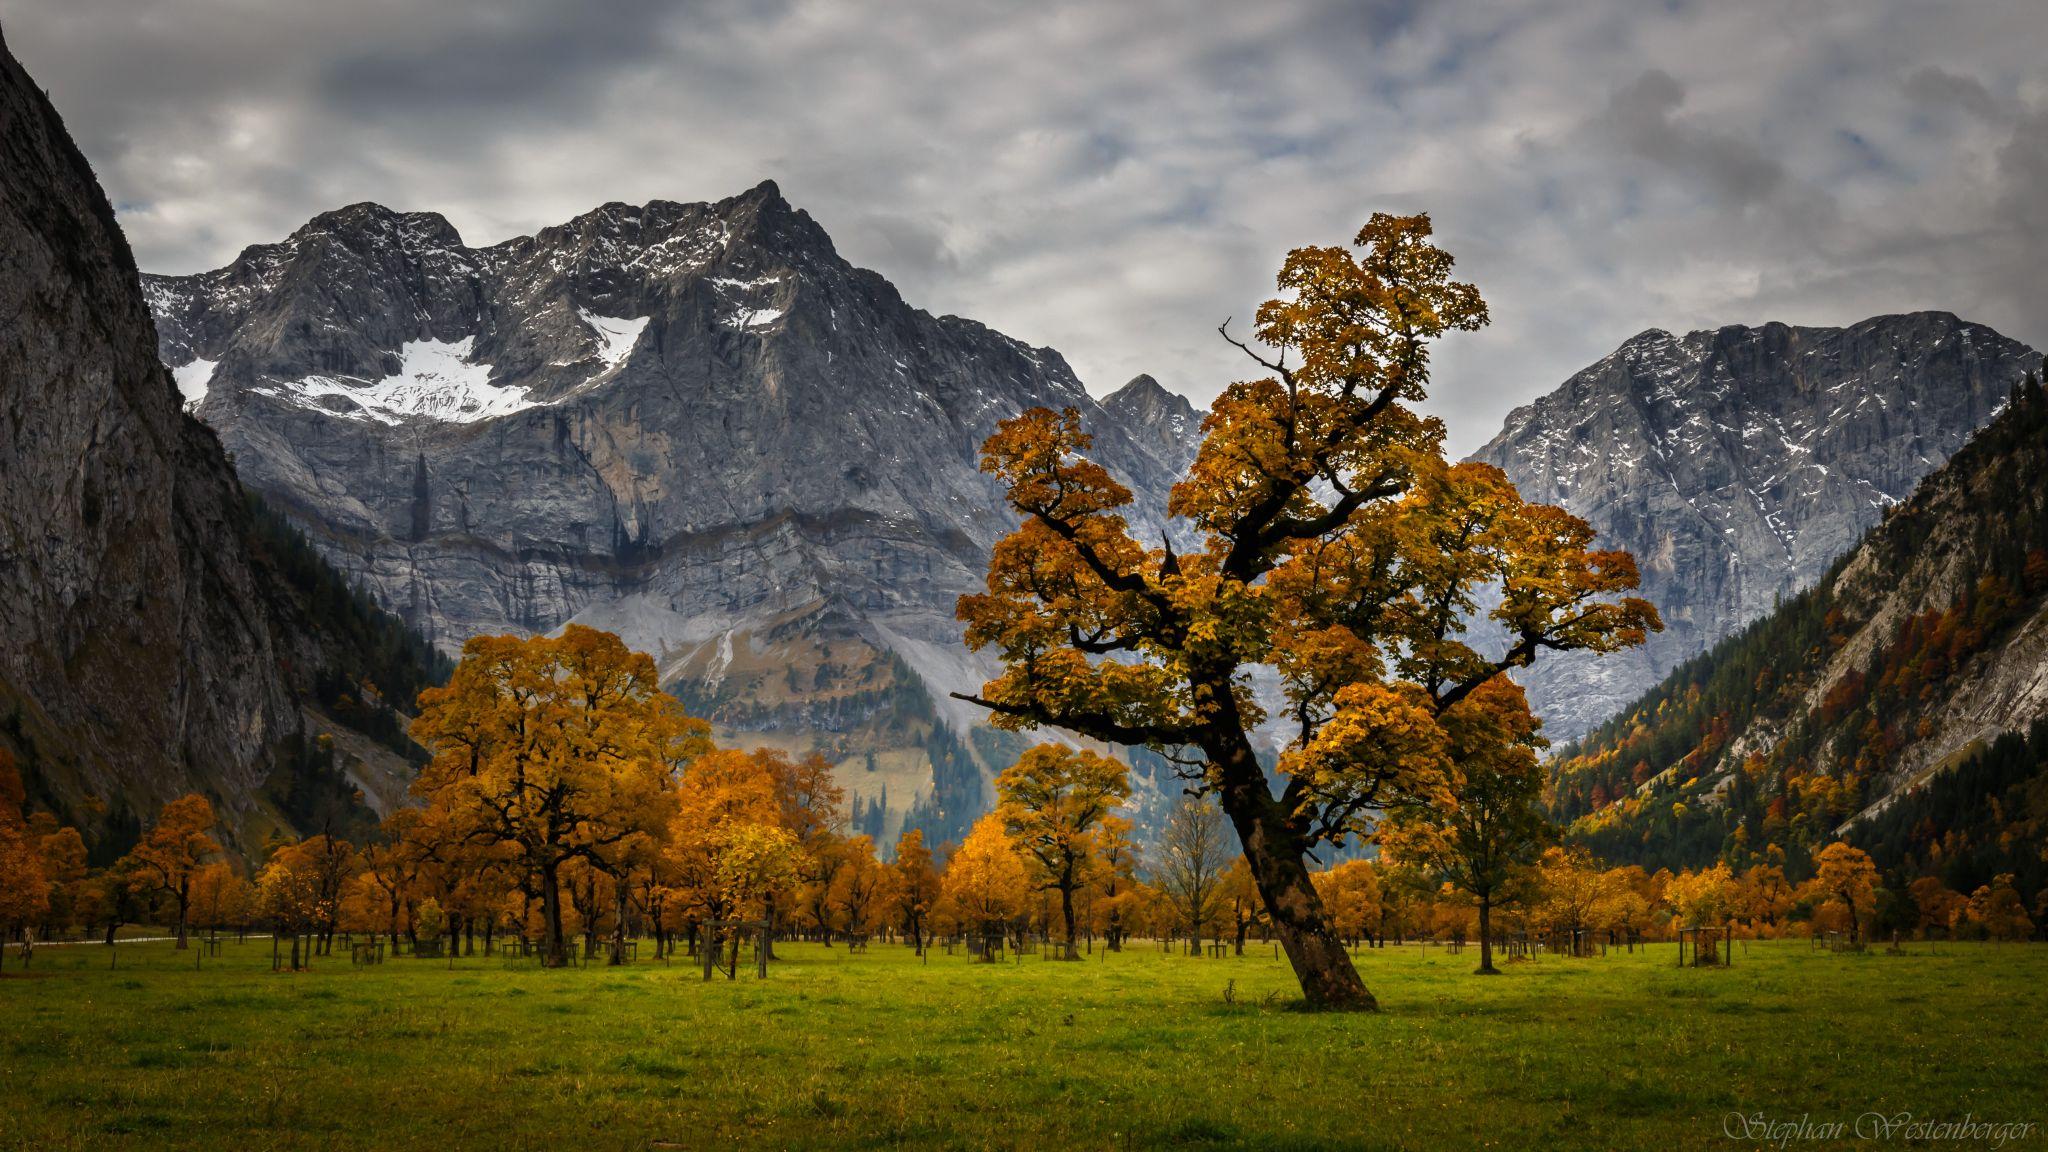 Ahornboden Nature Reserve, Austria